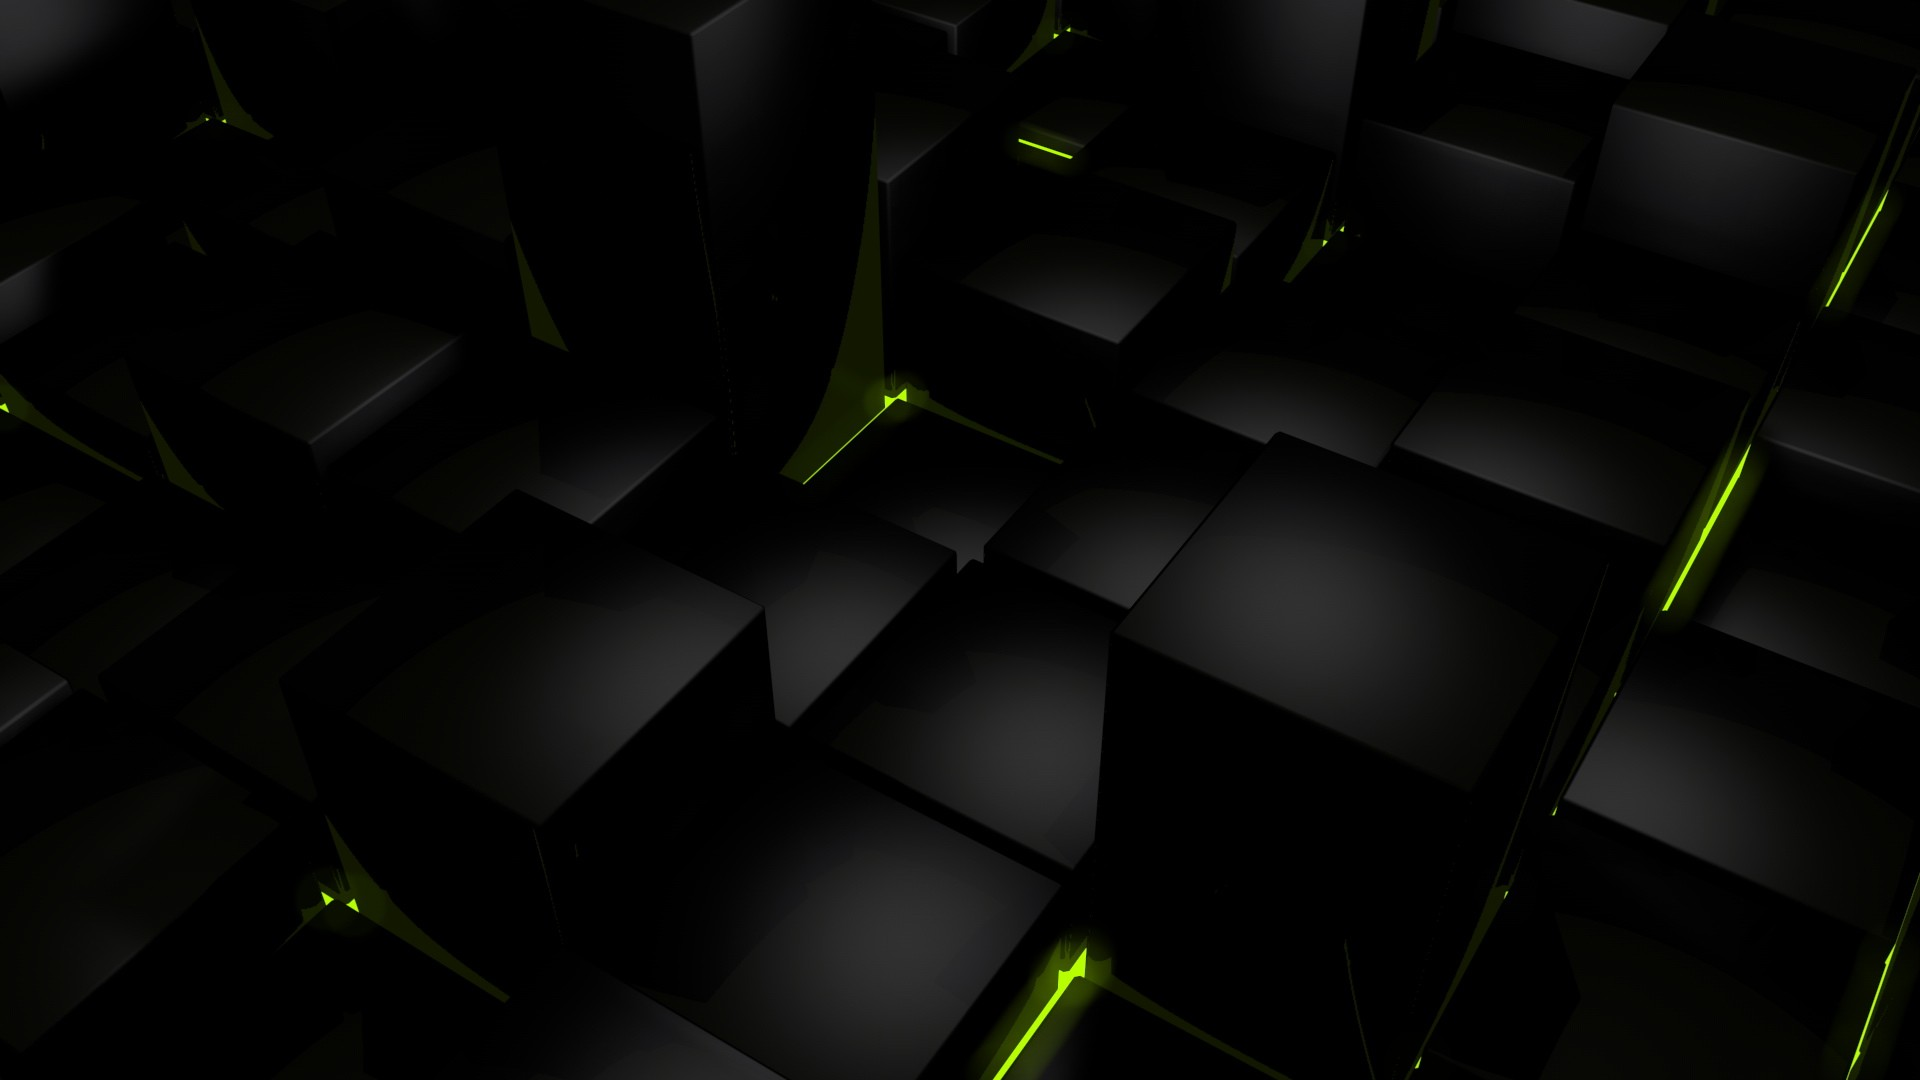 dark cubes glow computer graphics wallpaper background 1920x1080